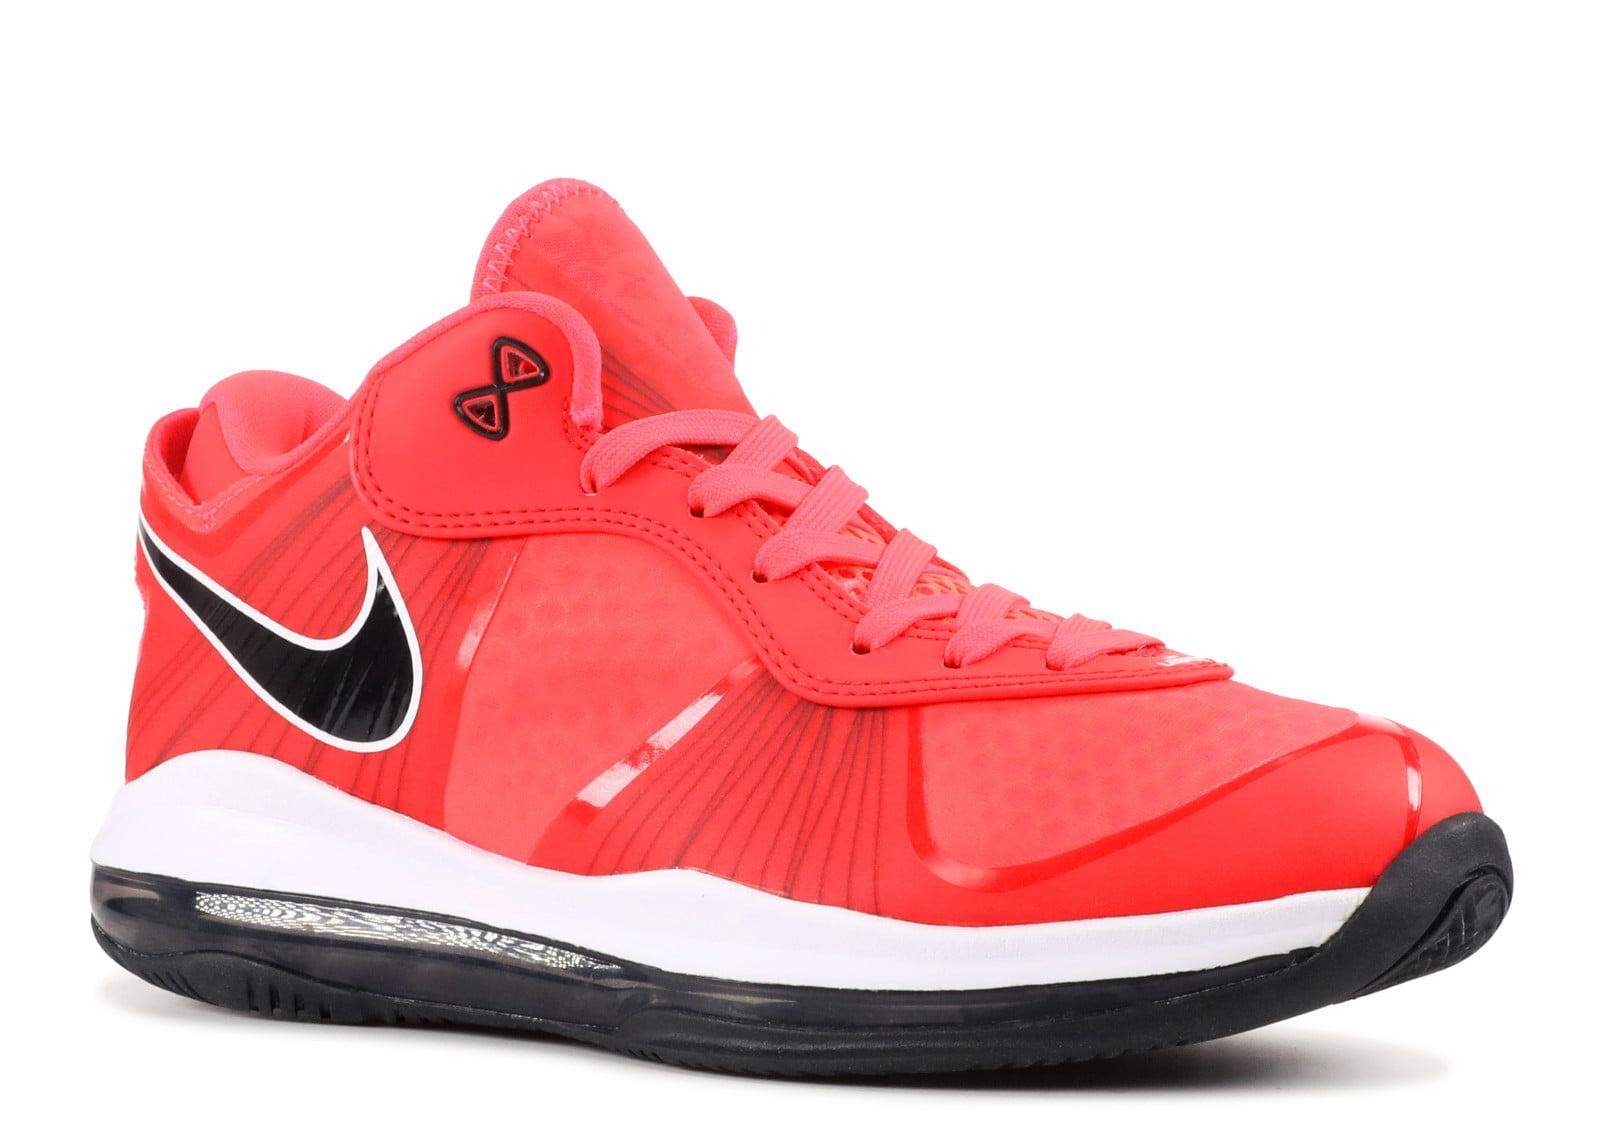 Nike - LEBRON 8 V/2 LOW 'SOLAR RED